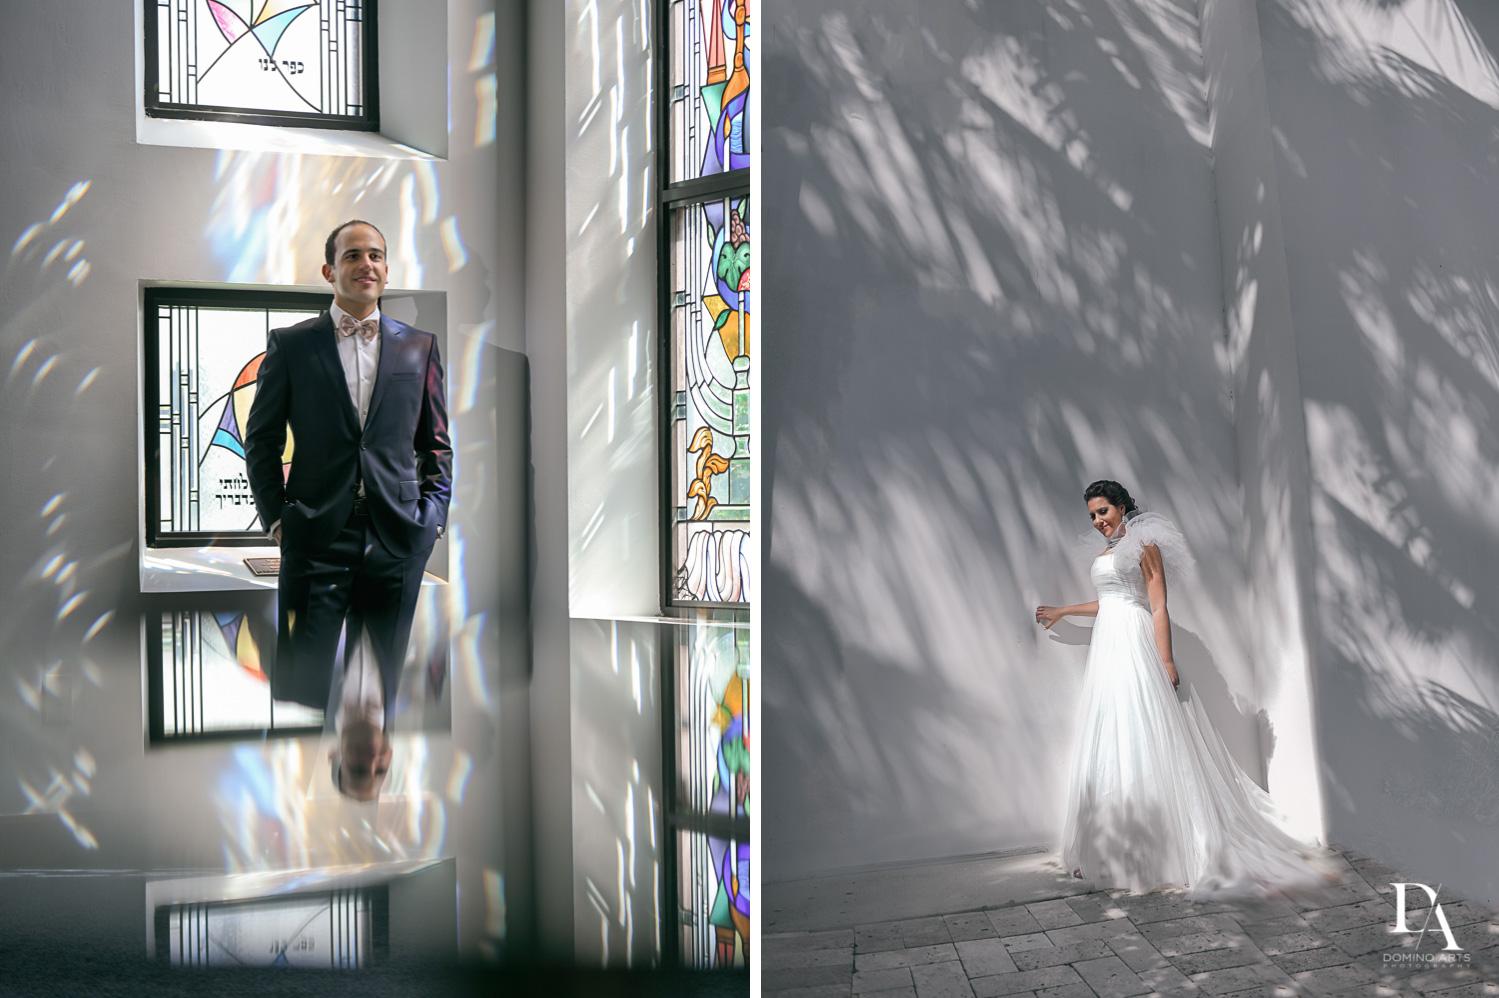 creative portraits at Fairy-Tale Wedding at BNai Torah Boca Raton by Domino Arts Photography